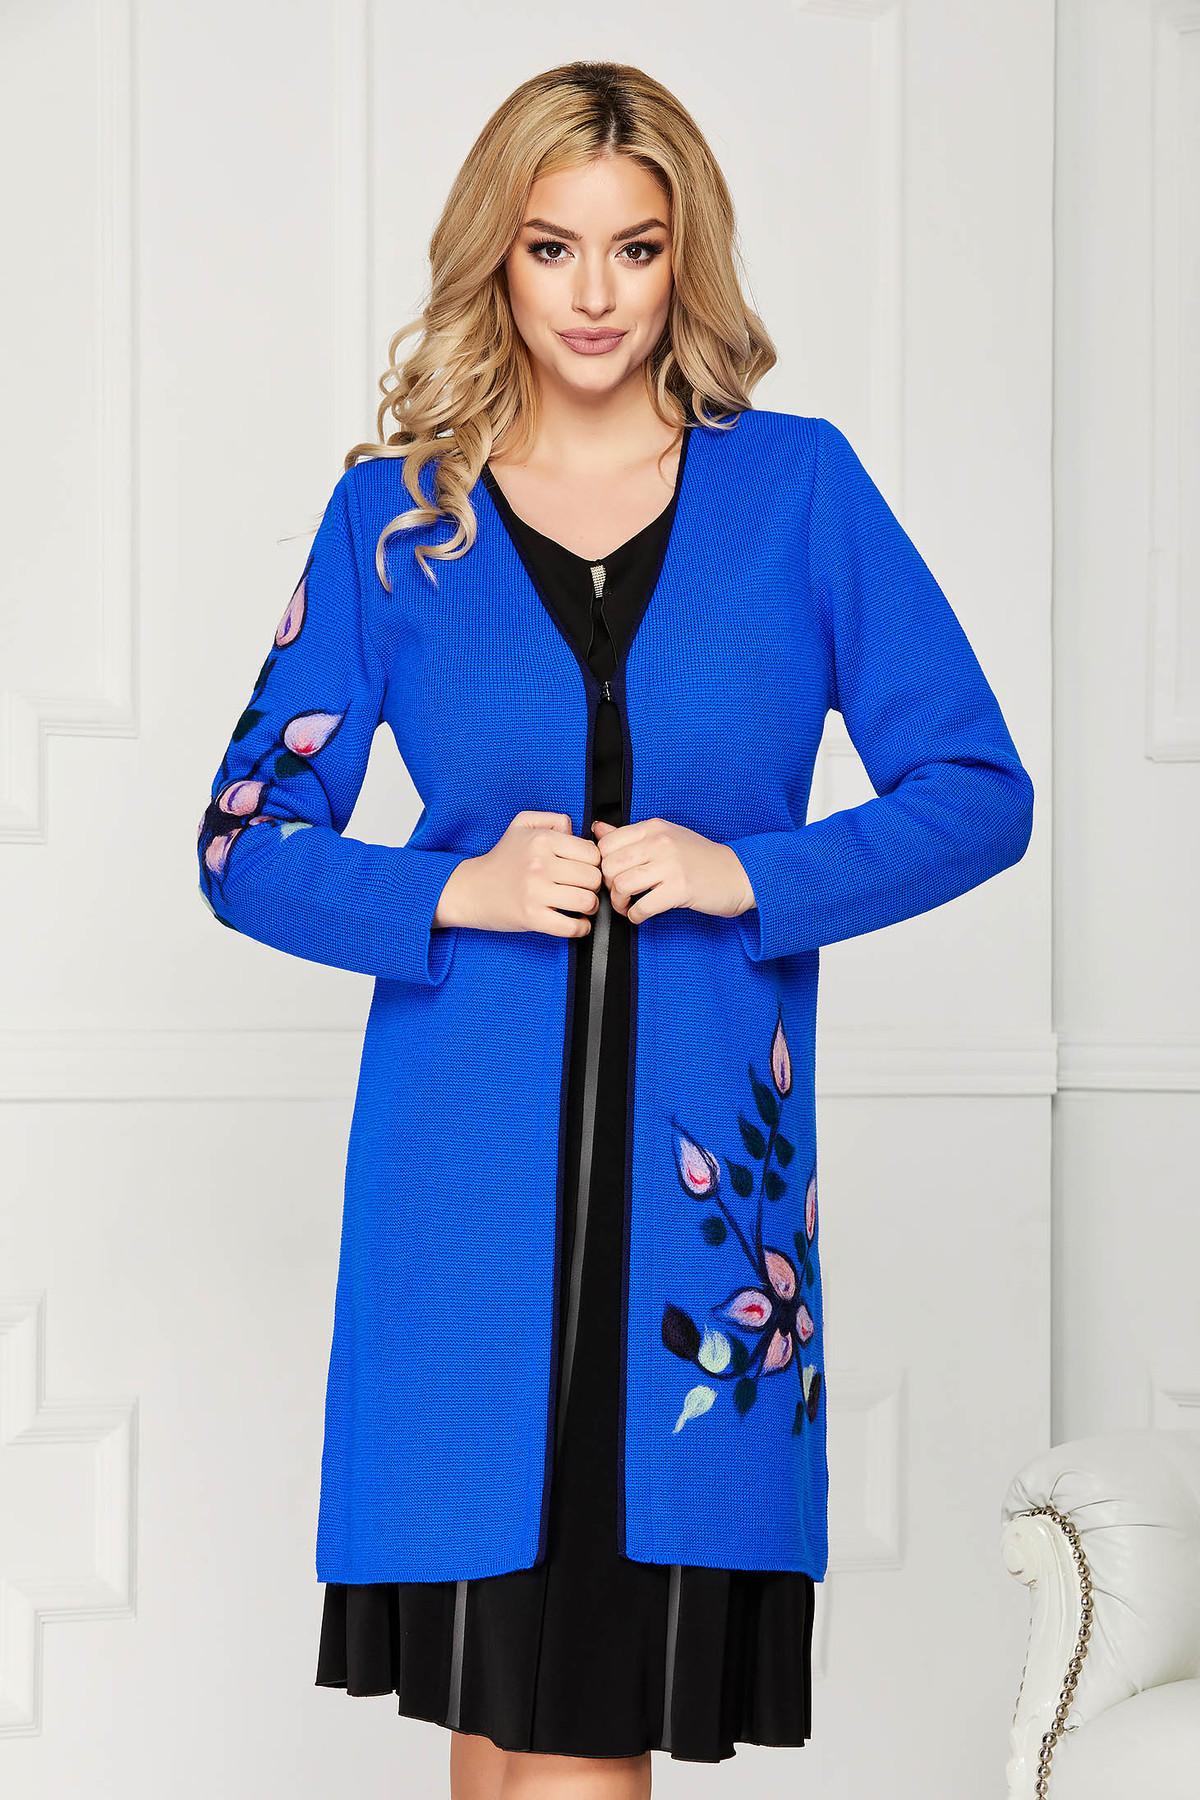 Cardigan albastru elegant din lana cu un croi drept cu maneci lungi si broderie florala